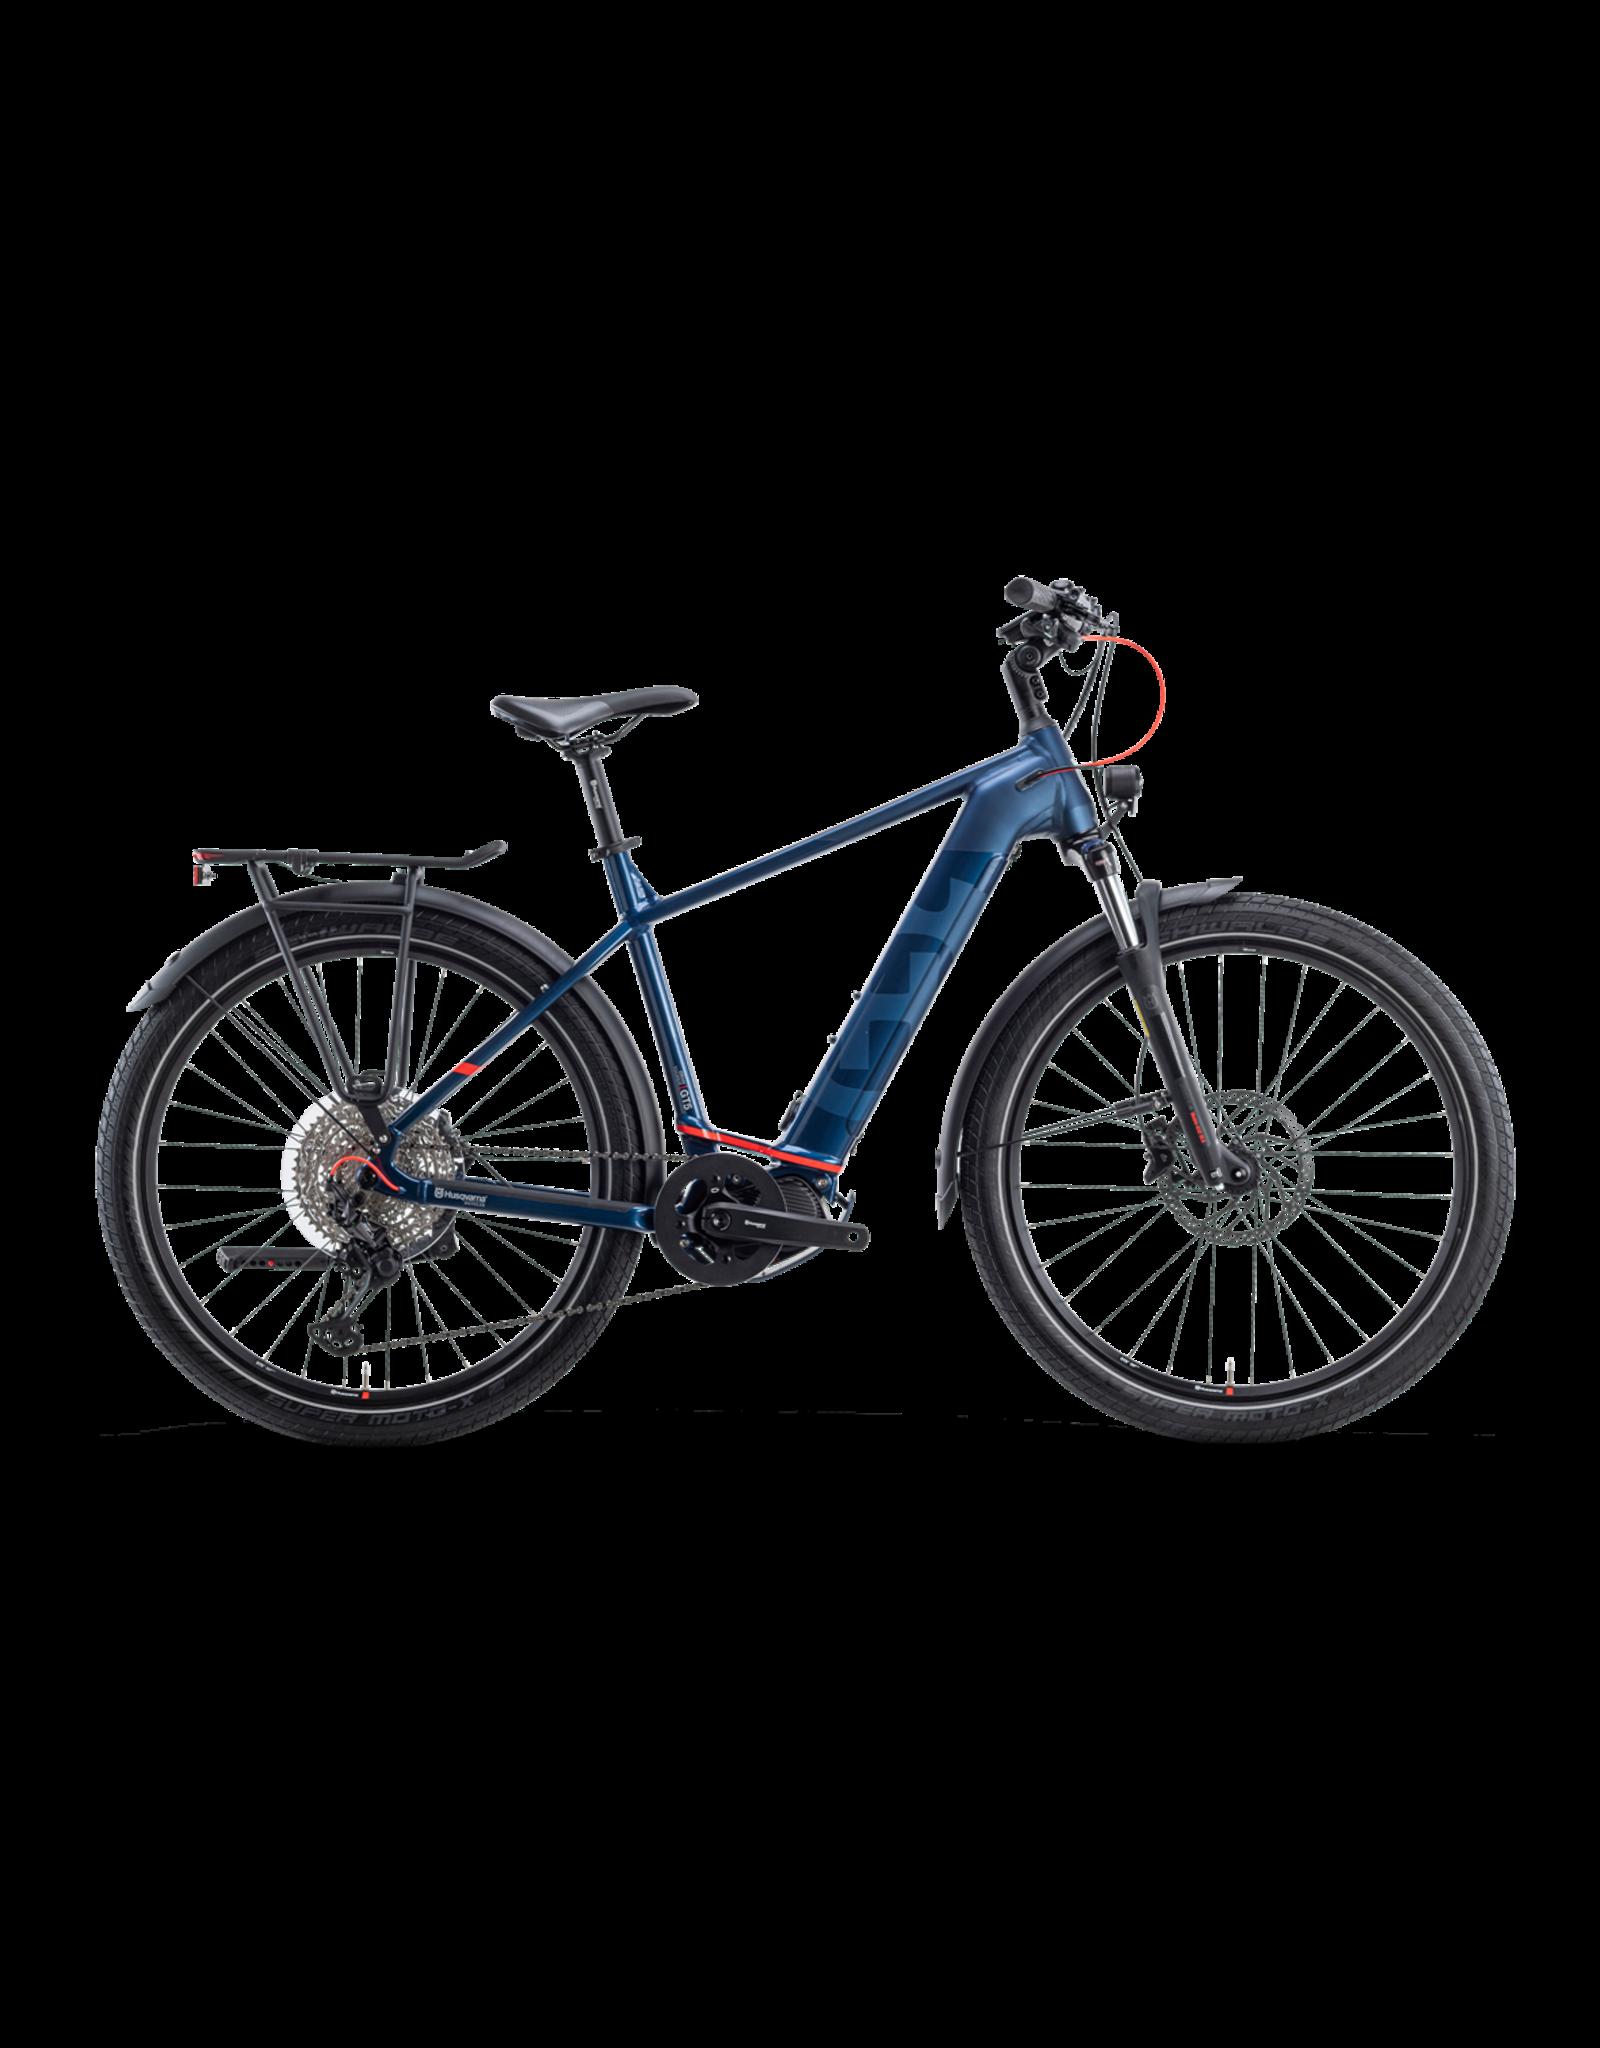 HUSQVARNA Bicycles Husqvarna Bicycles - Gran Tourer GT5 Gent - 2021